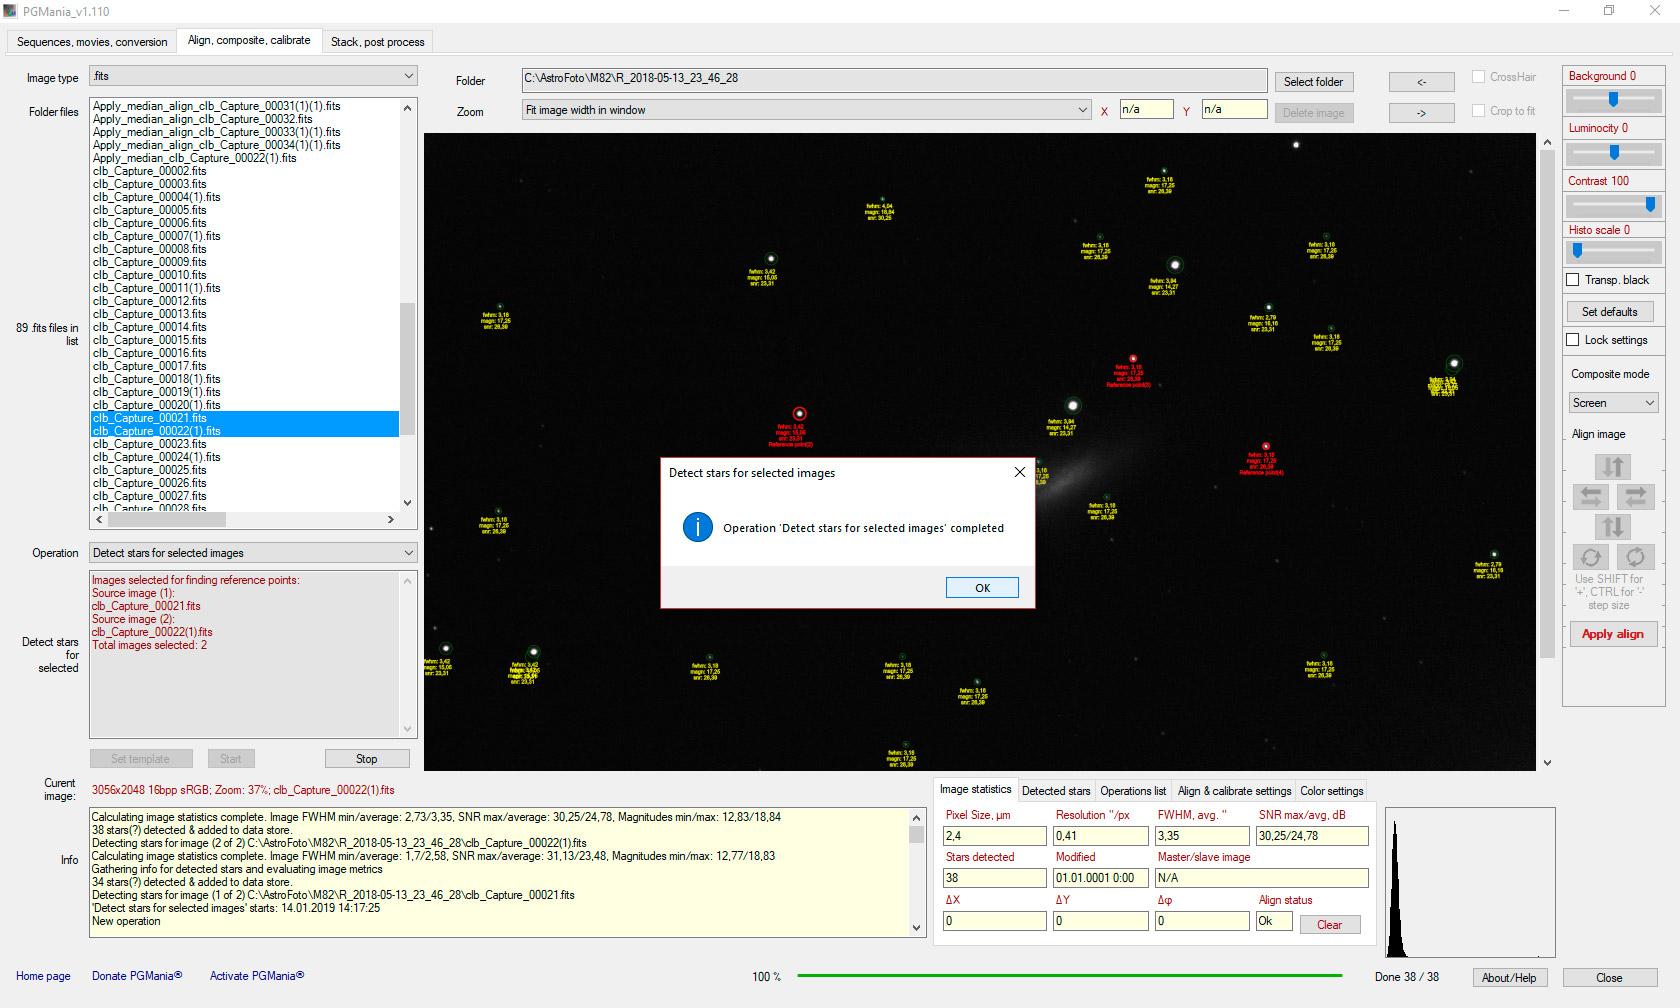 detecting stars and image statistics